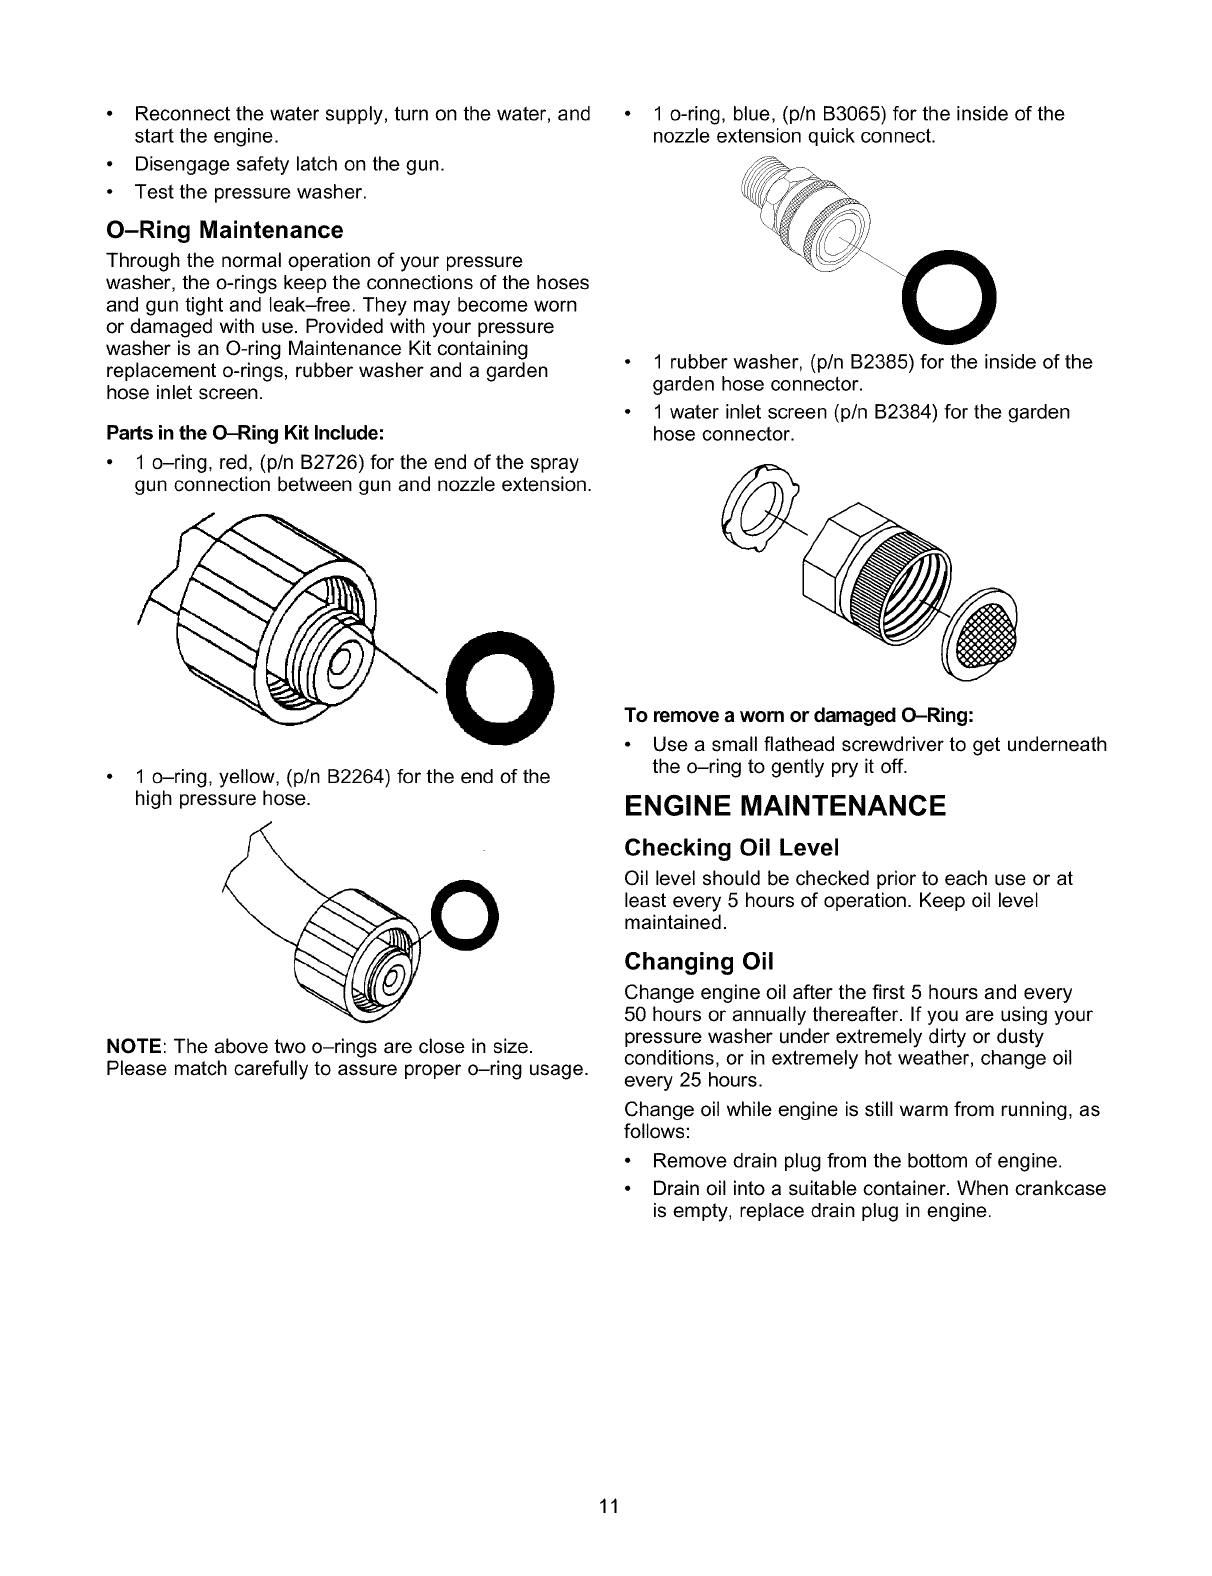 Craftsman 580768331 User Manual Pressure Washer Manuals And Guides Ring Flat Baja M8 Reconnectthewatersupplyturnonthewaterand